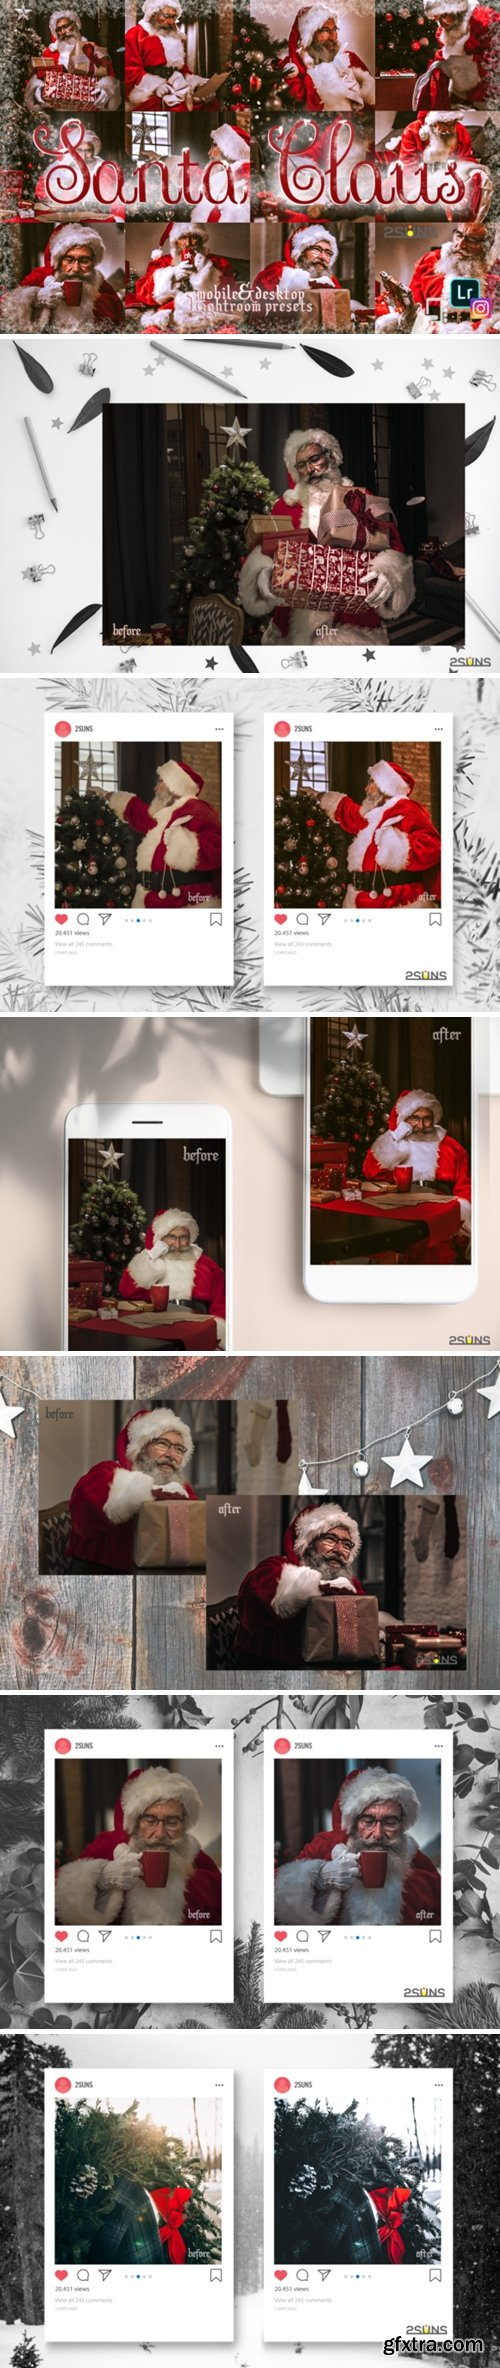 5 Santa Claus Lightroom Preset Christmas 2139083